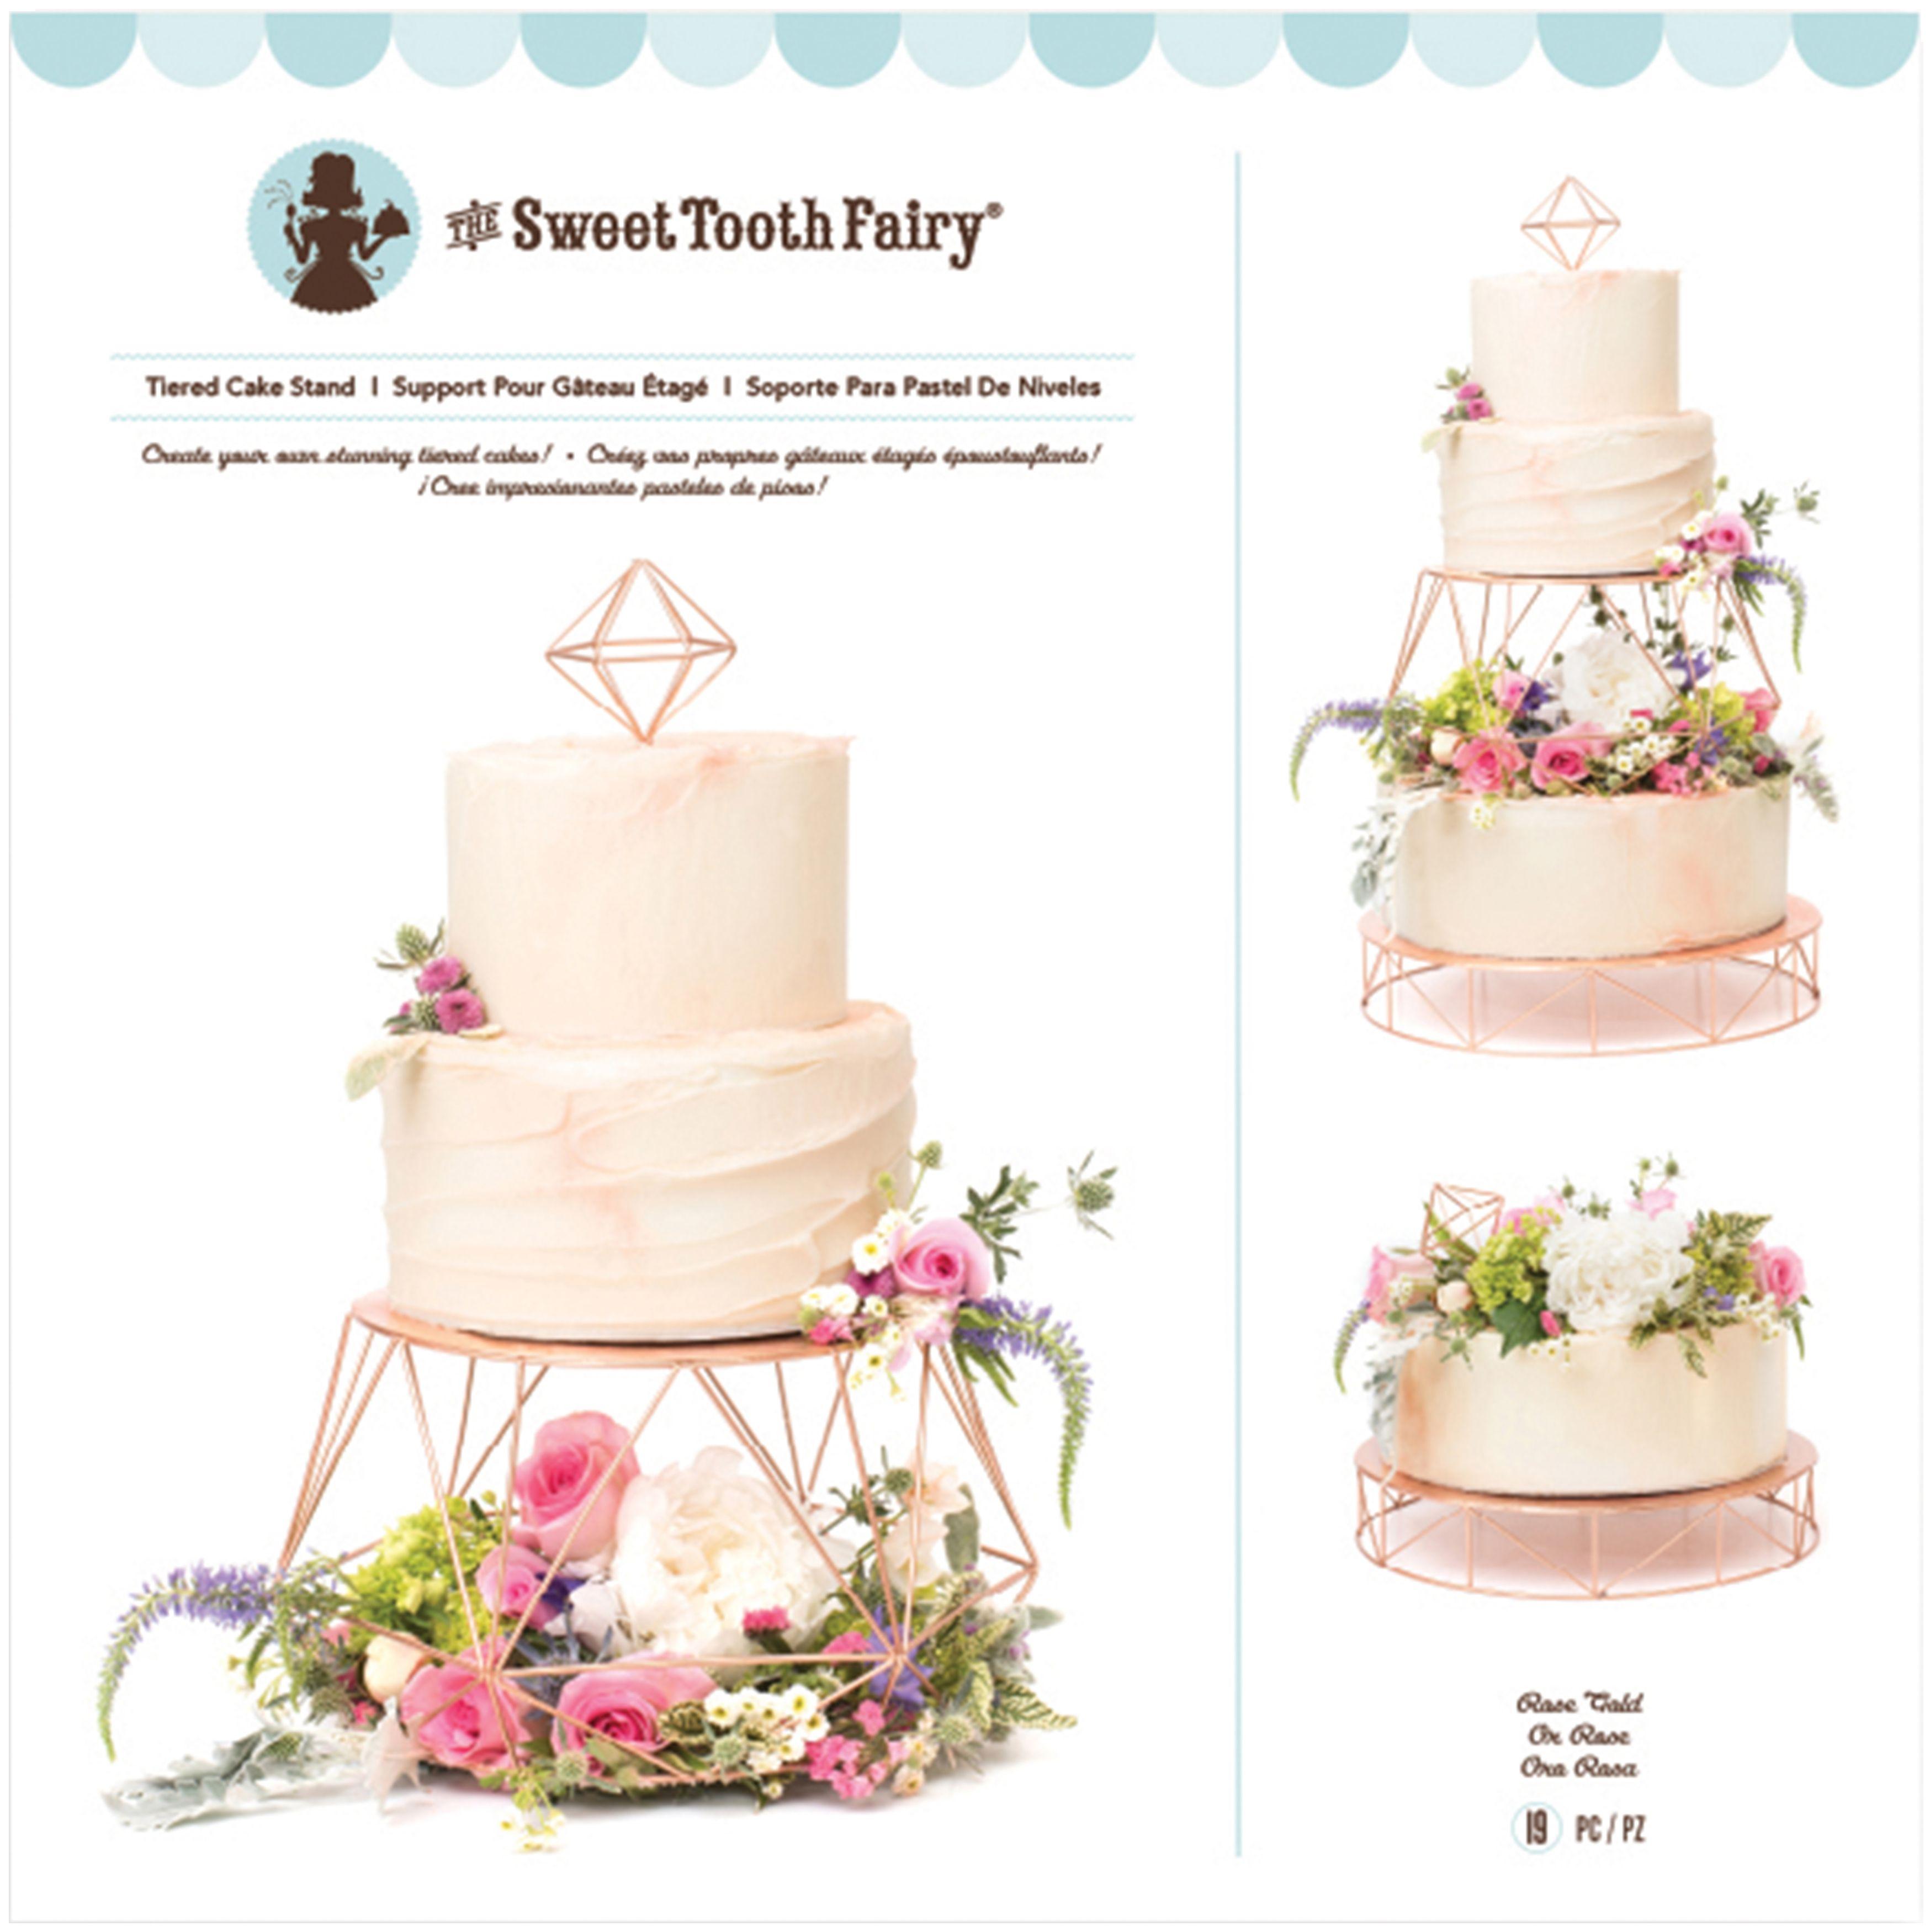 9a99c2cccf83b75bf5b96779ddf9b3e8 - Sweet Tooth Fairy Job Application